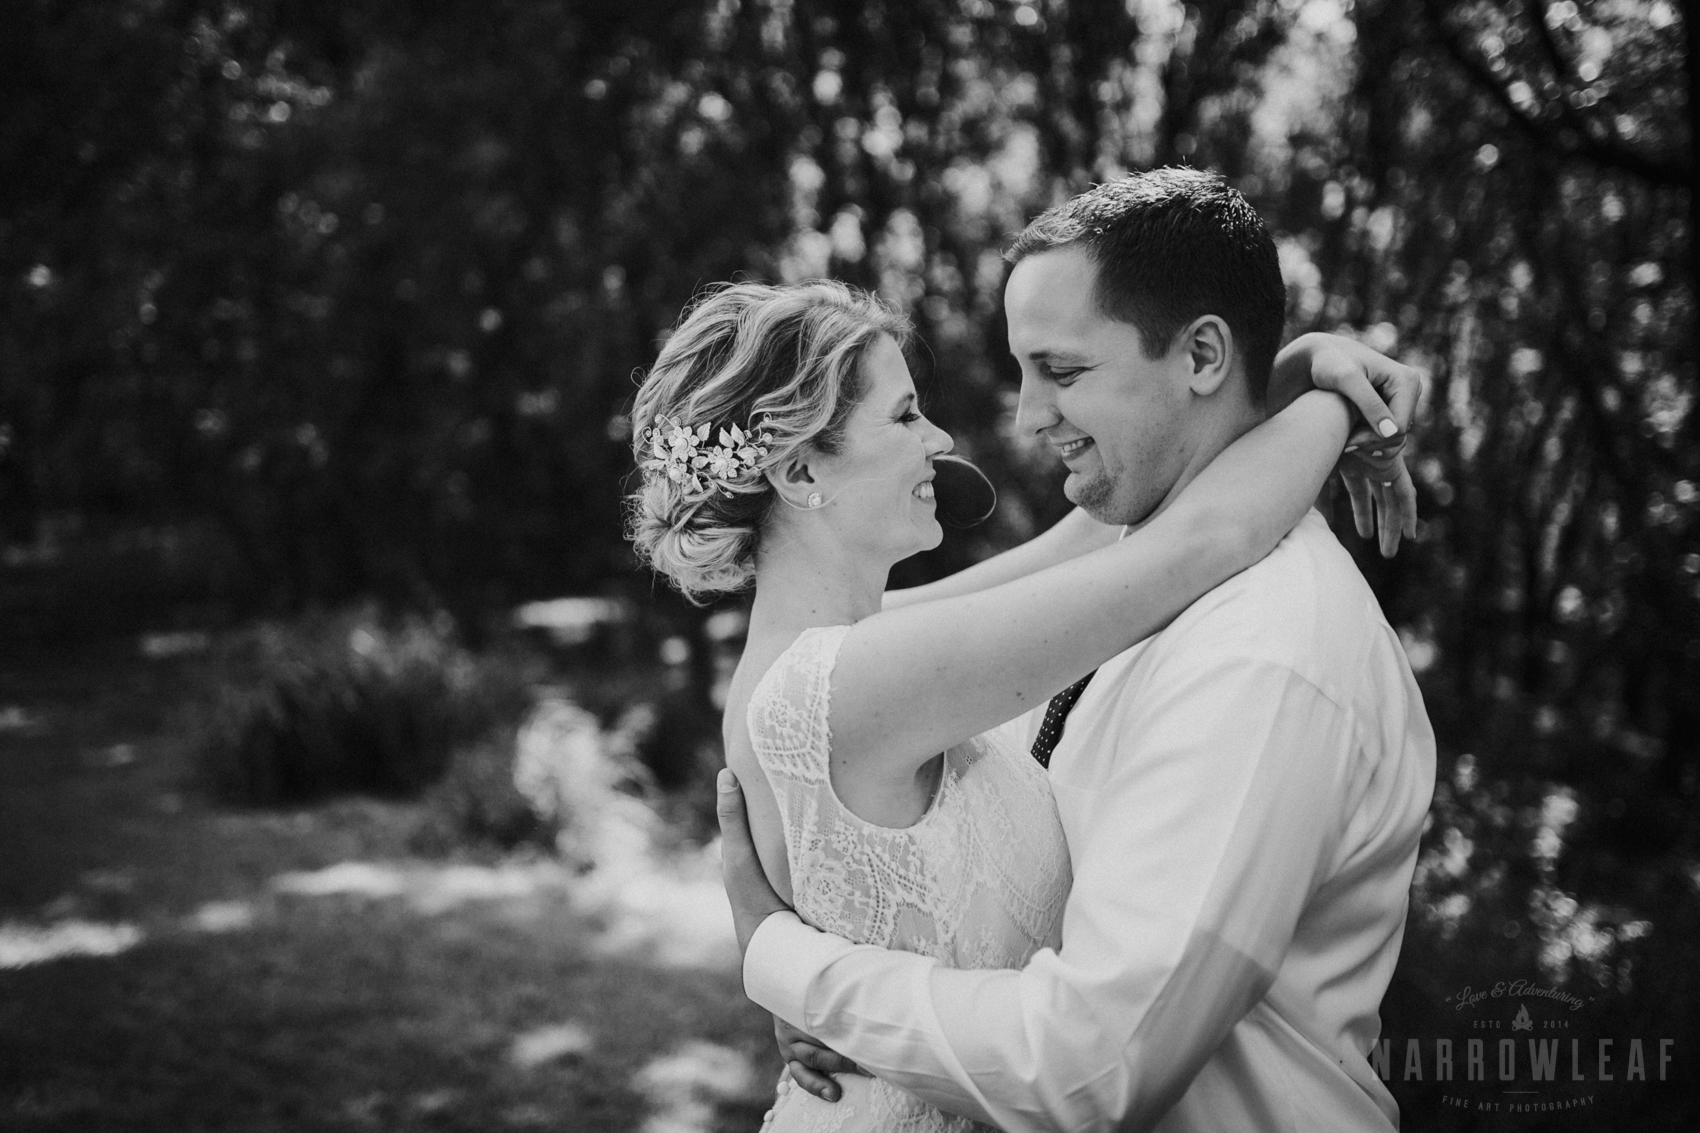 bride-groom-classy-wedding-photos-outdoors-34.jpg